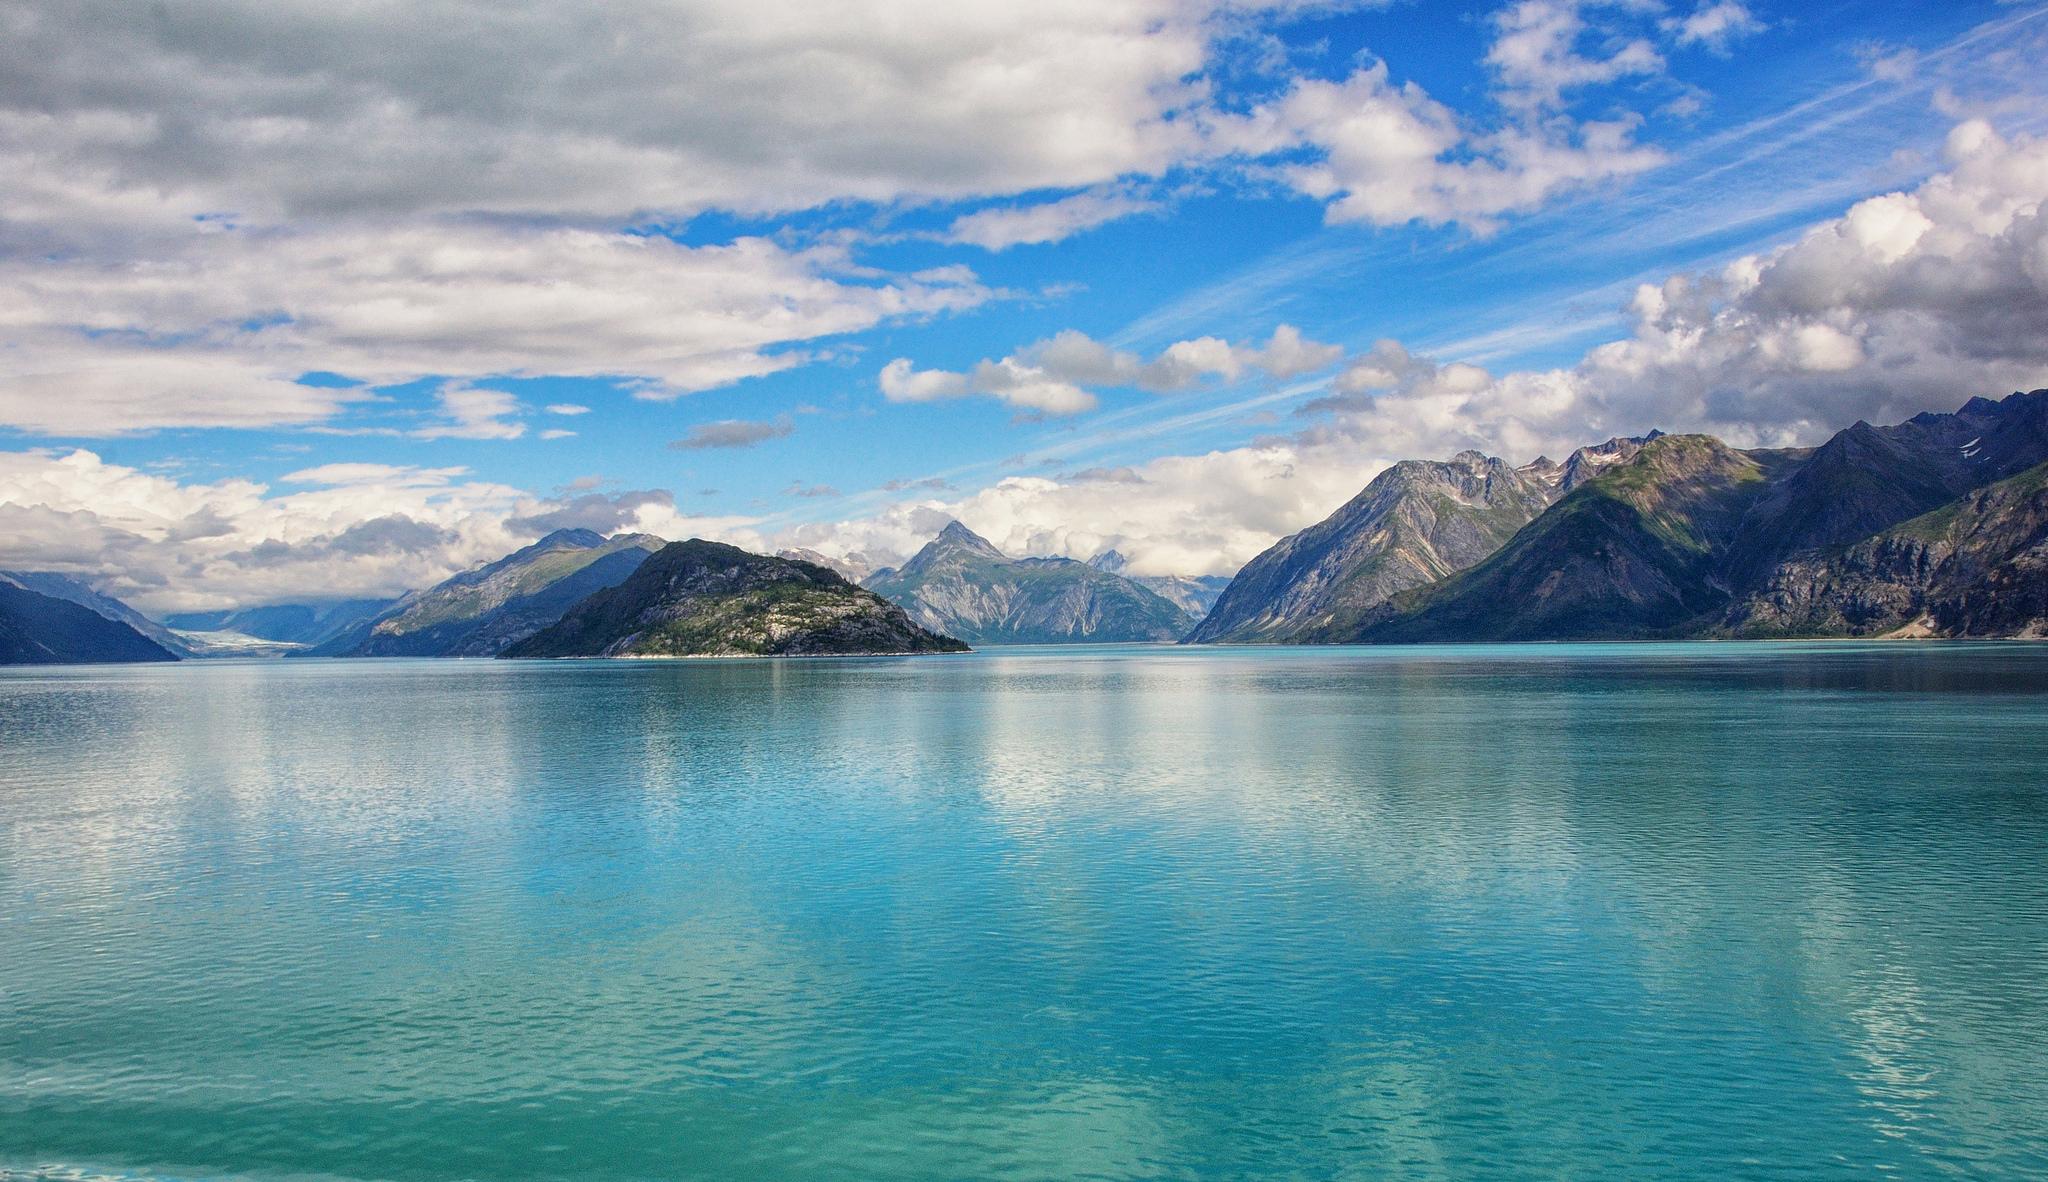 природа горы облака озеро небо облака без смс